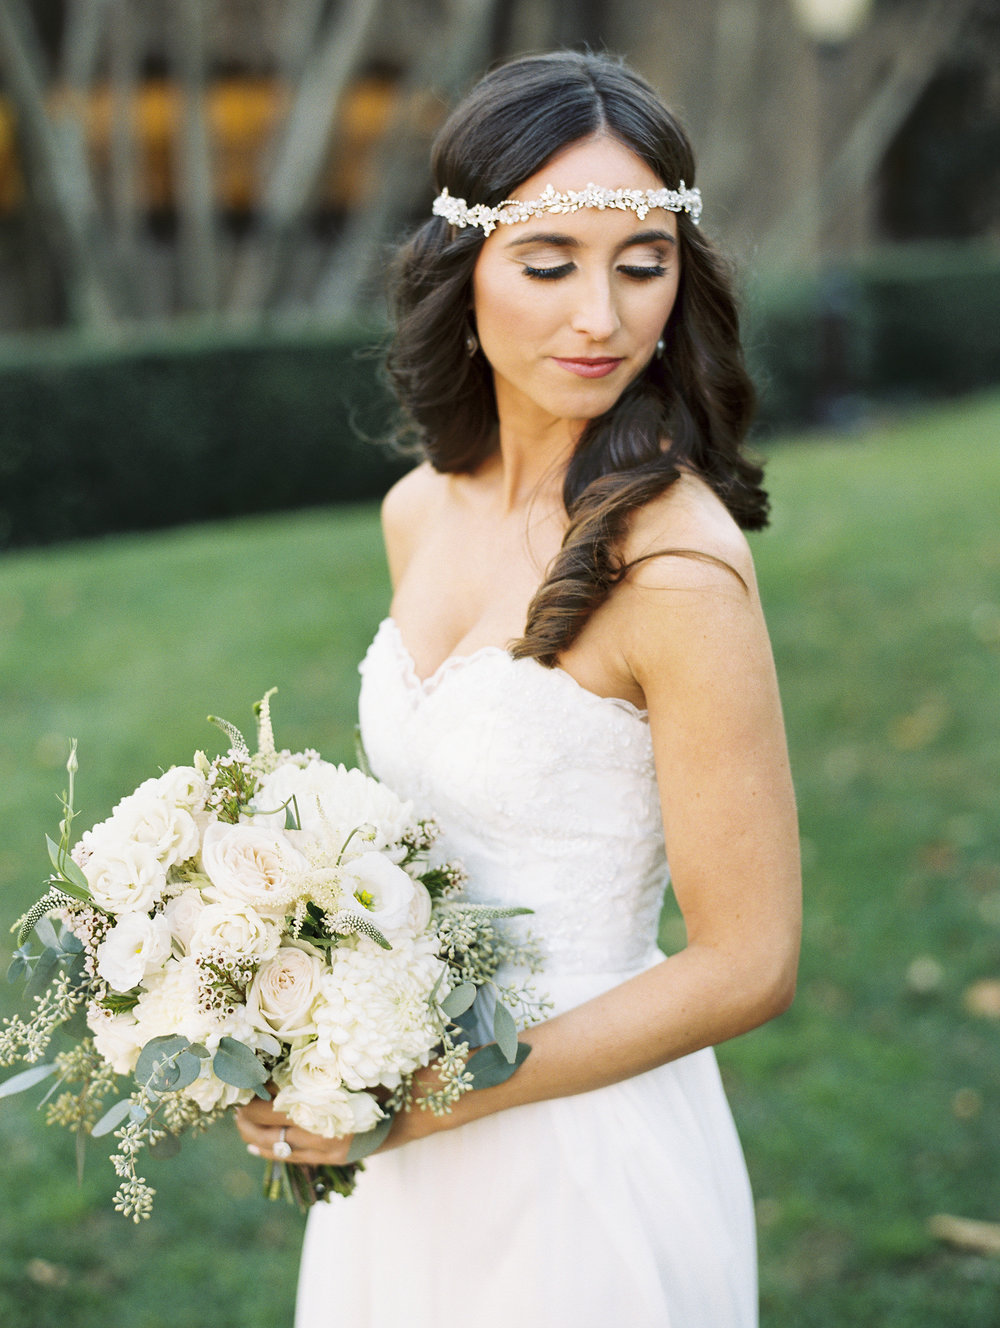 Tymia Yvette |Bridal Airbrush Makeup | DC Weddings